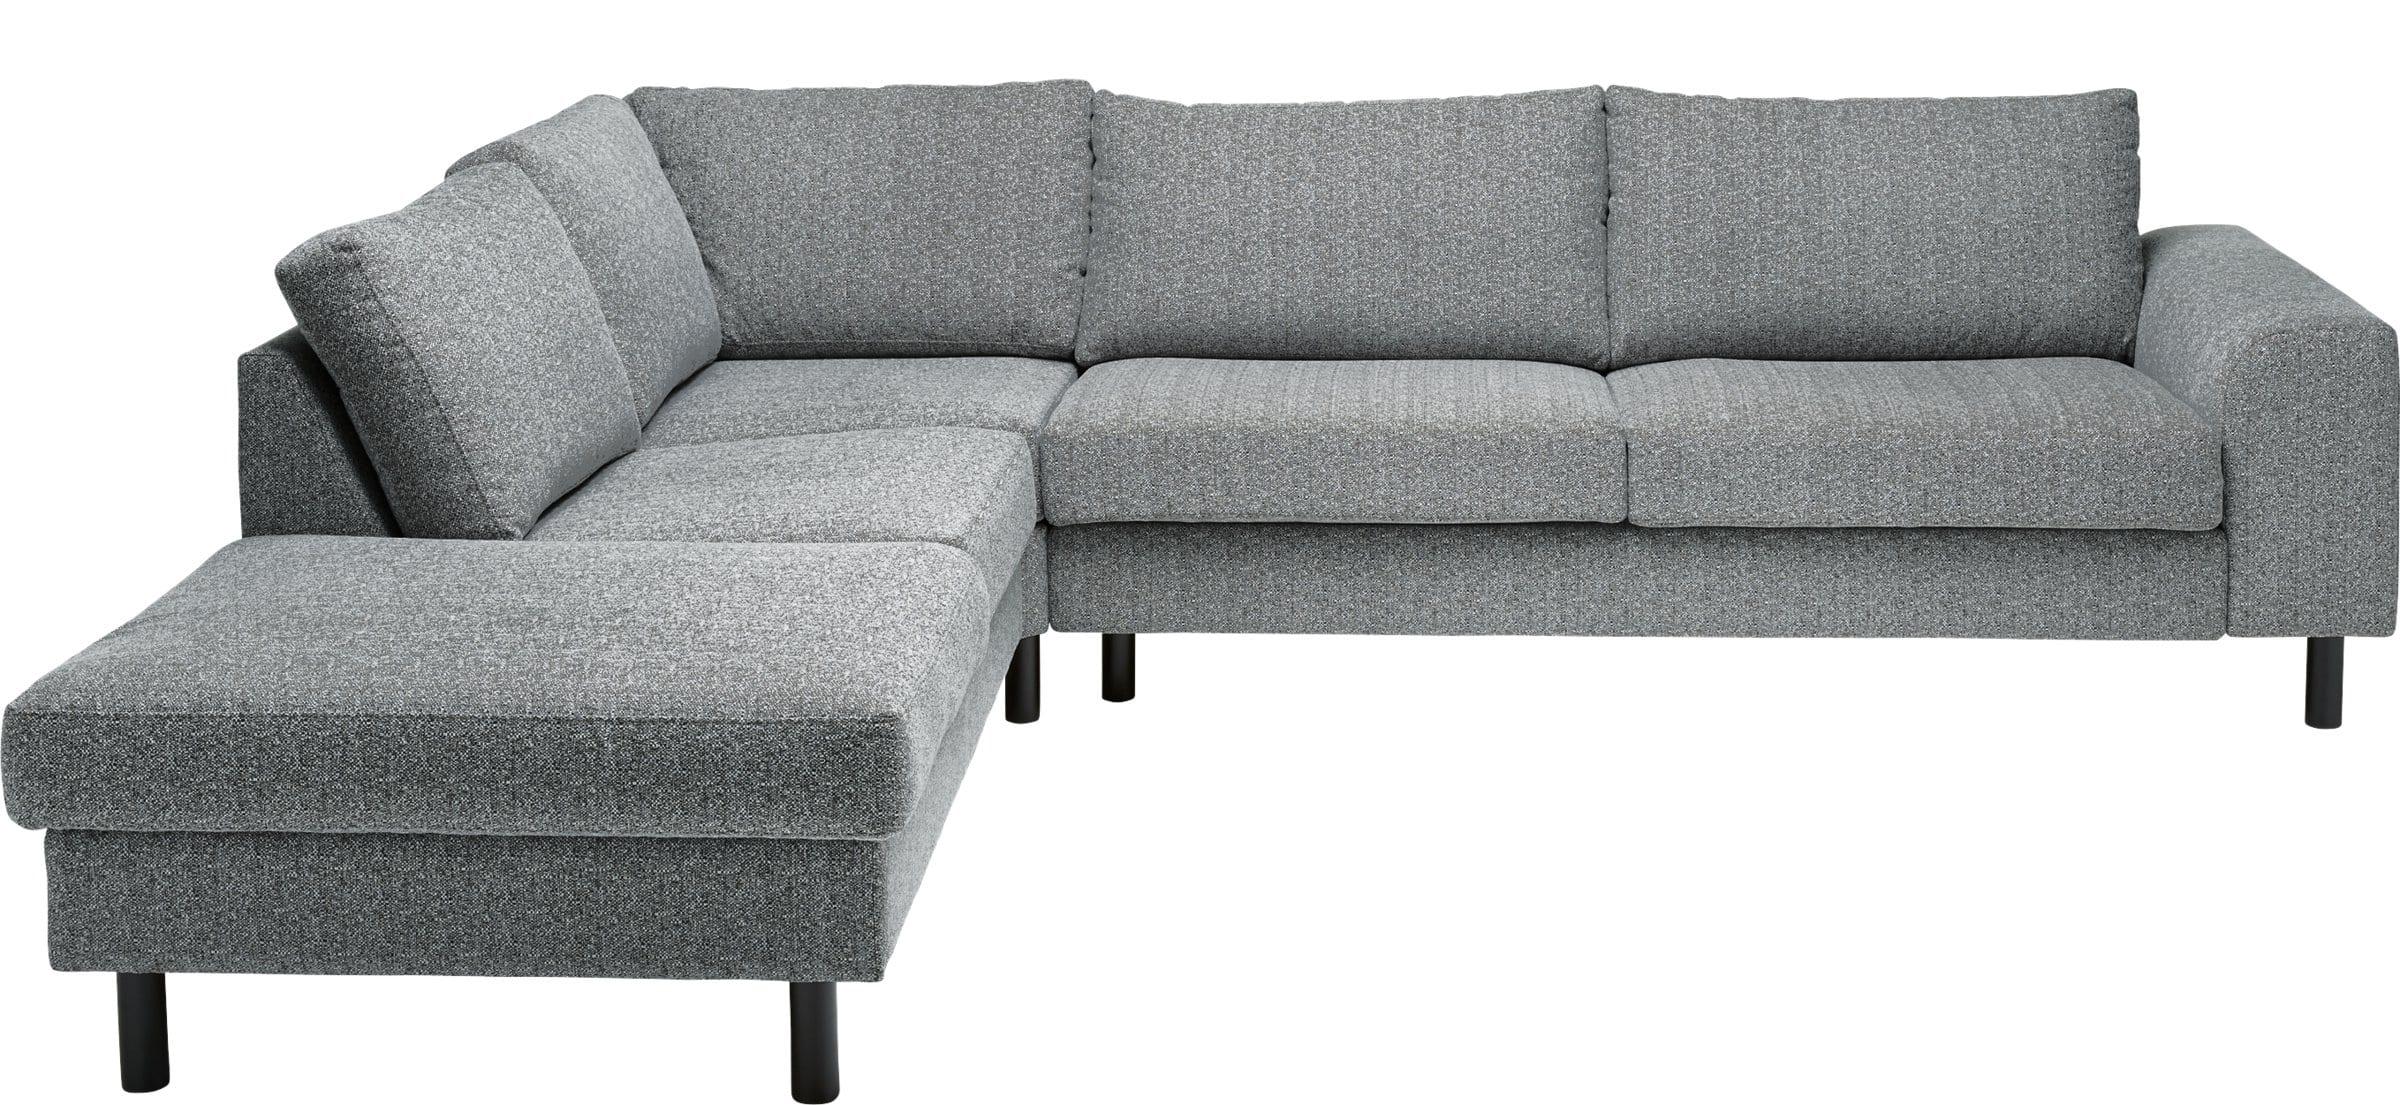 DIENER Canapé d'angle